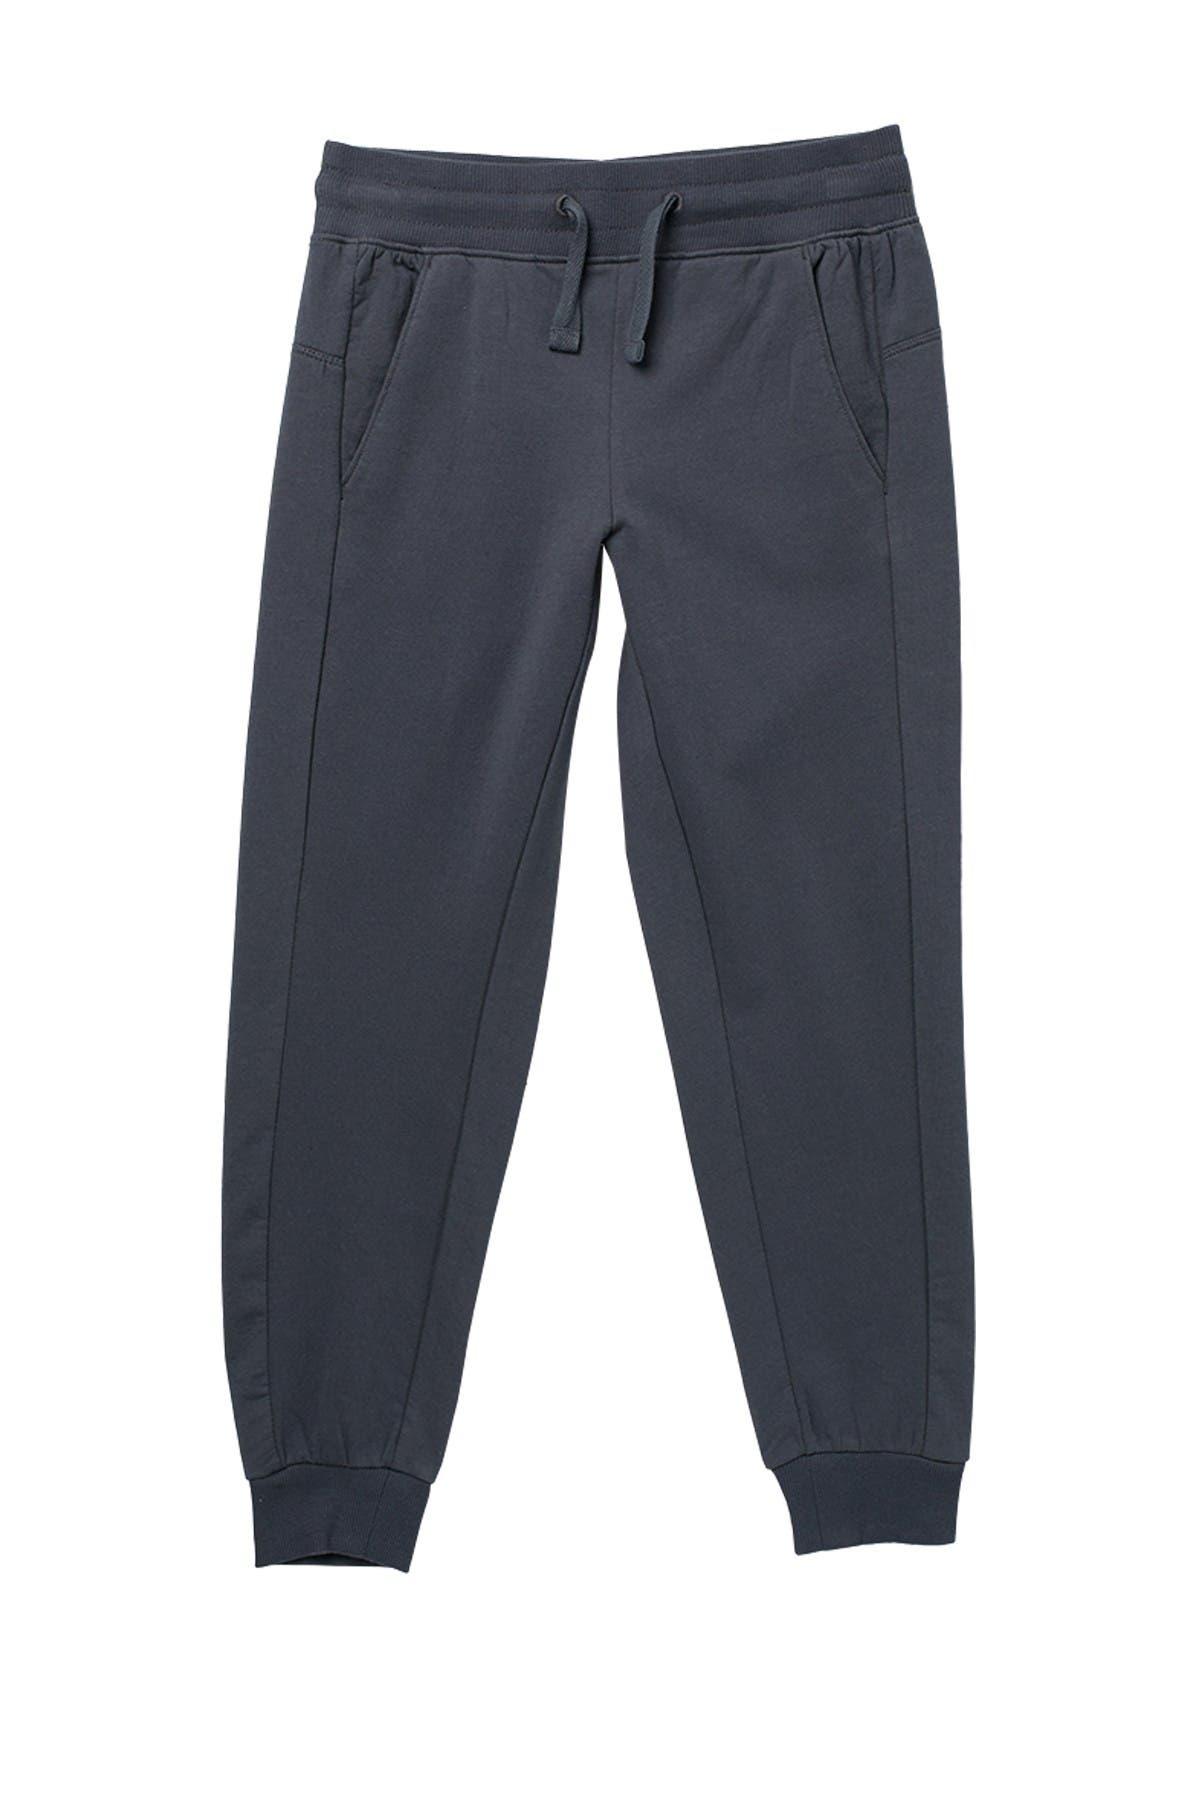 Image of Z by Zella Girl Replay Slim Jogger Pants